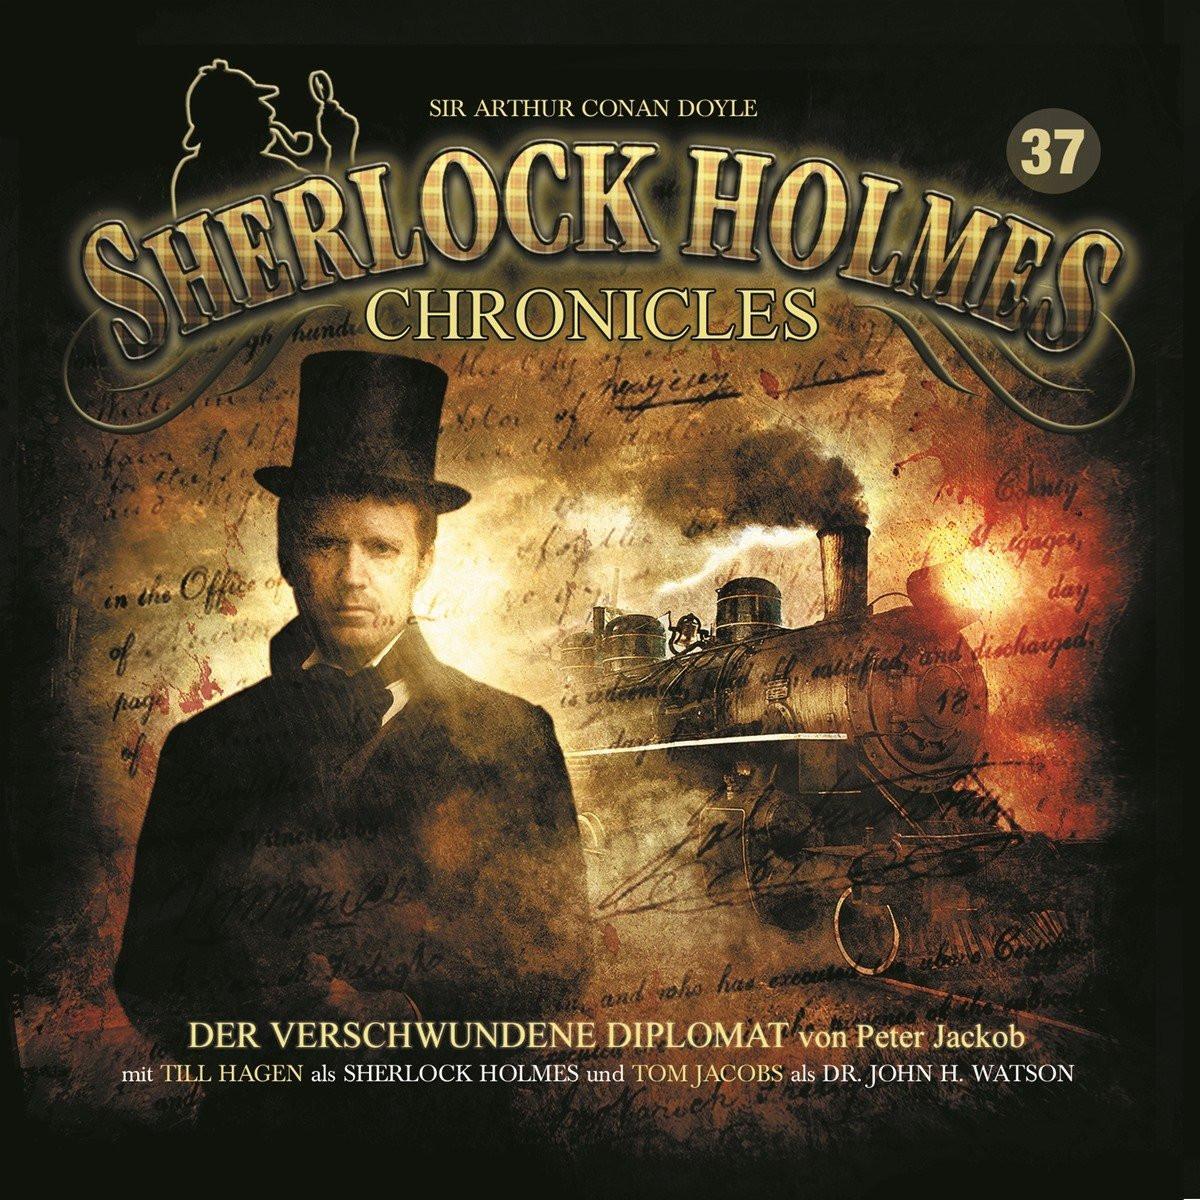 Sherlock Holmes Chronicles 37 Der verschwundene Diplomat